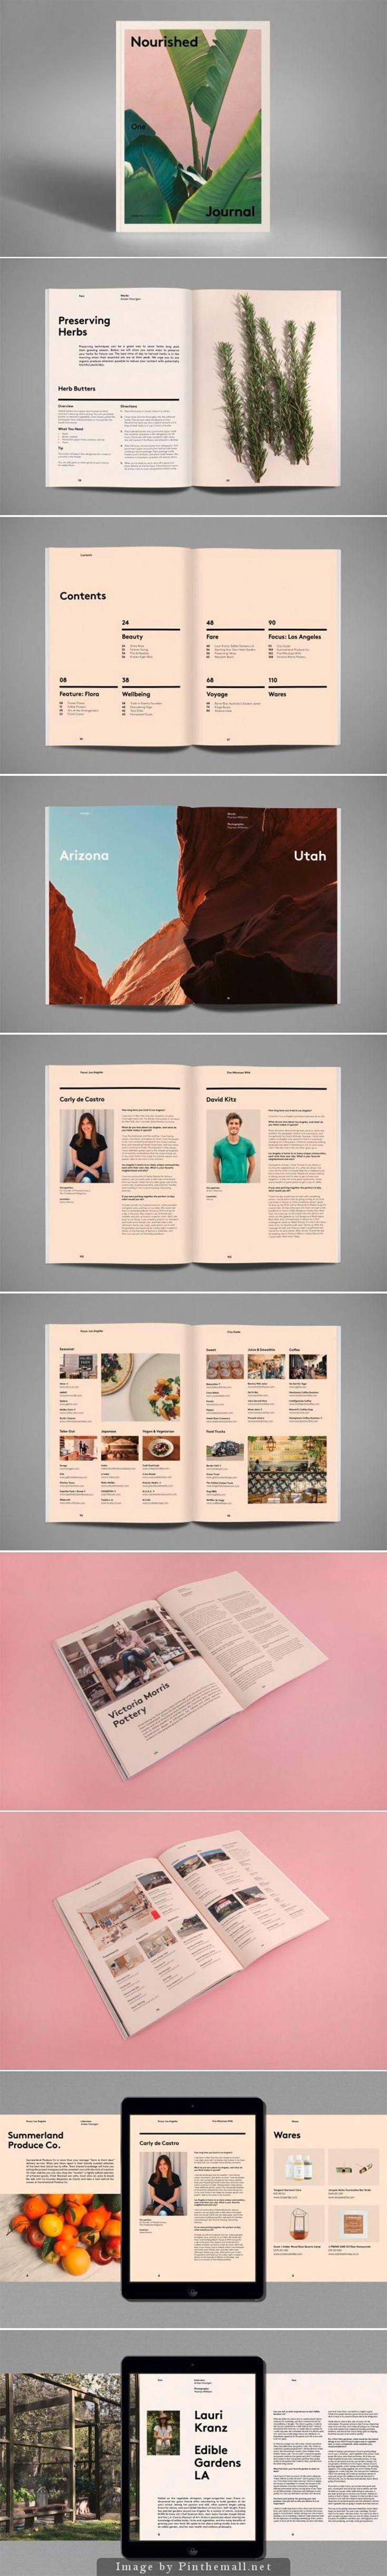 Nourished Journal | Sept. 2014. #graphicdesign #layoutmagazine